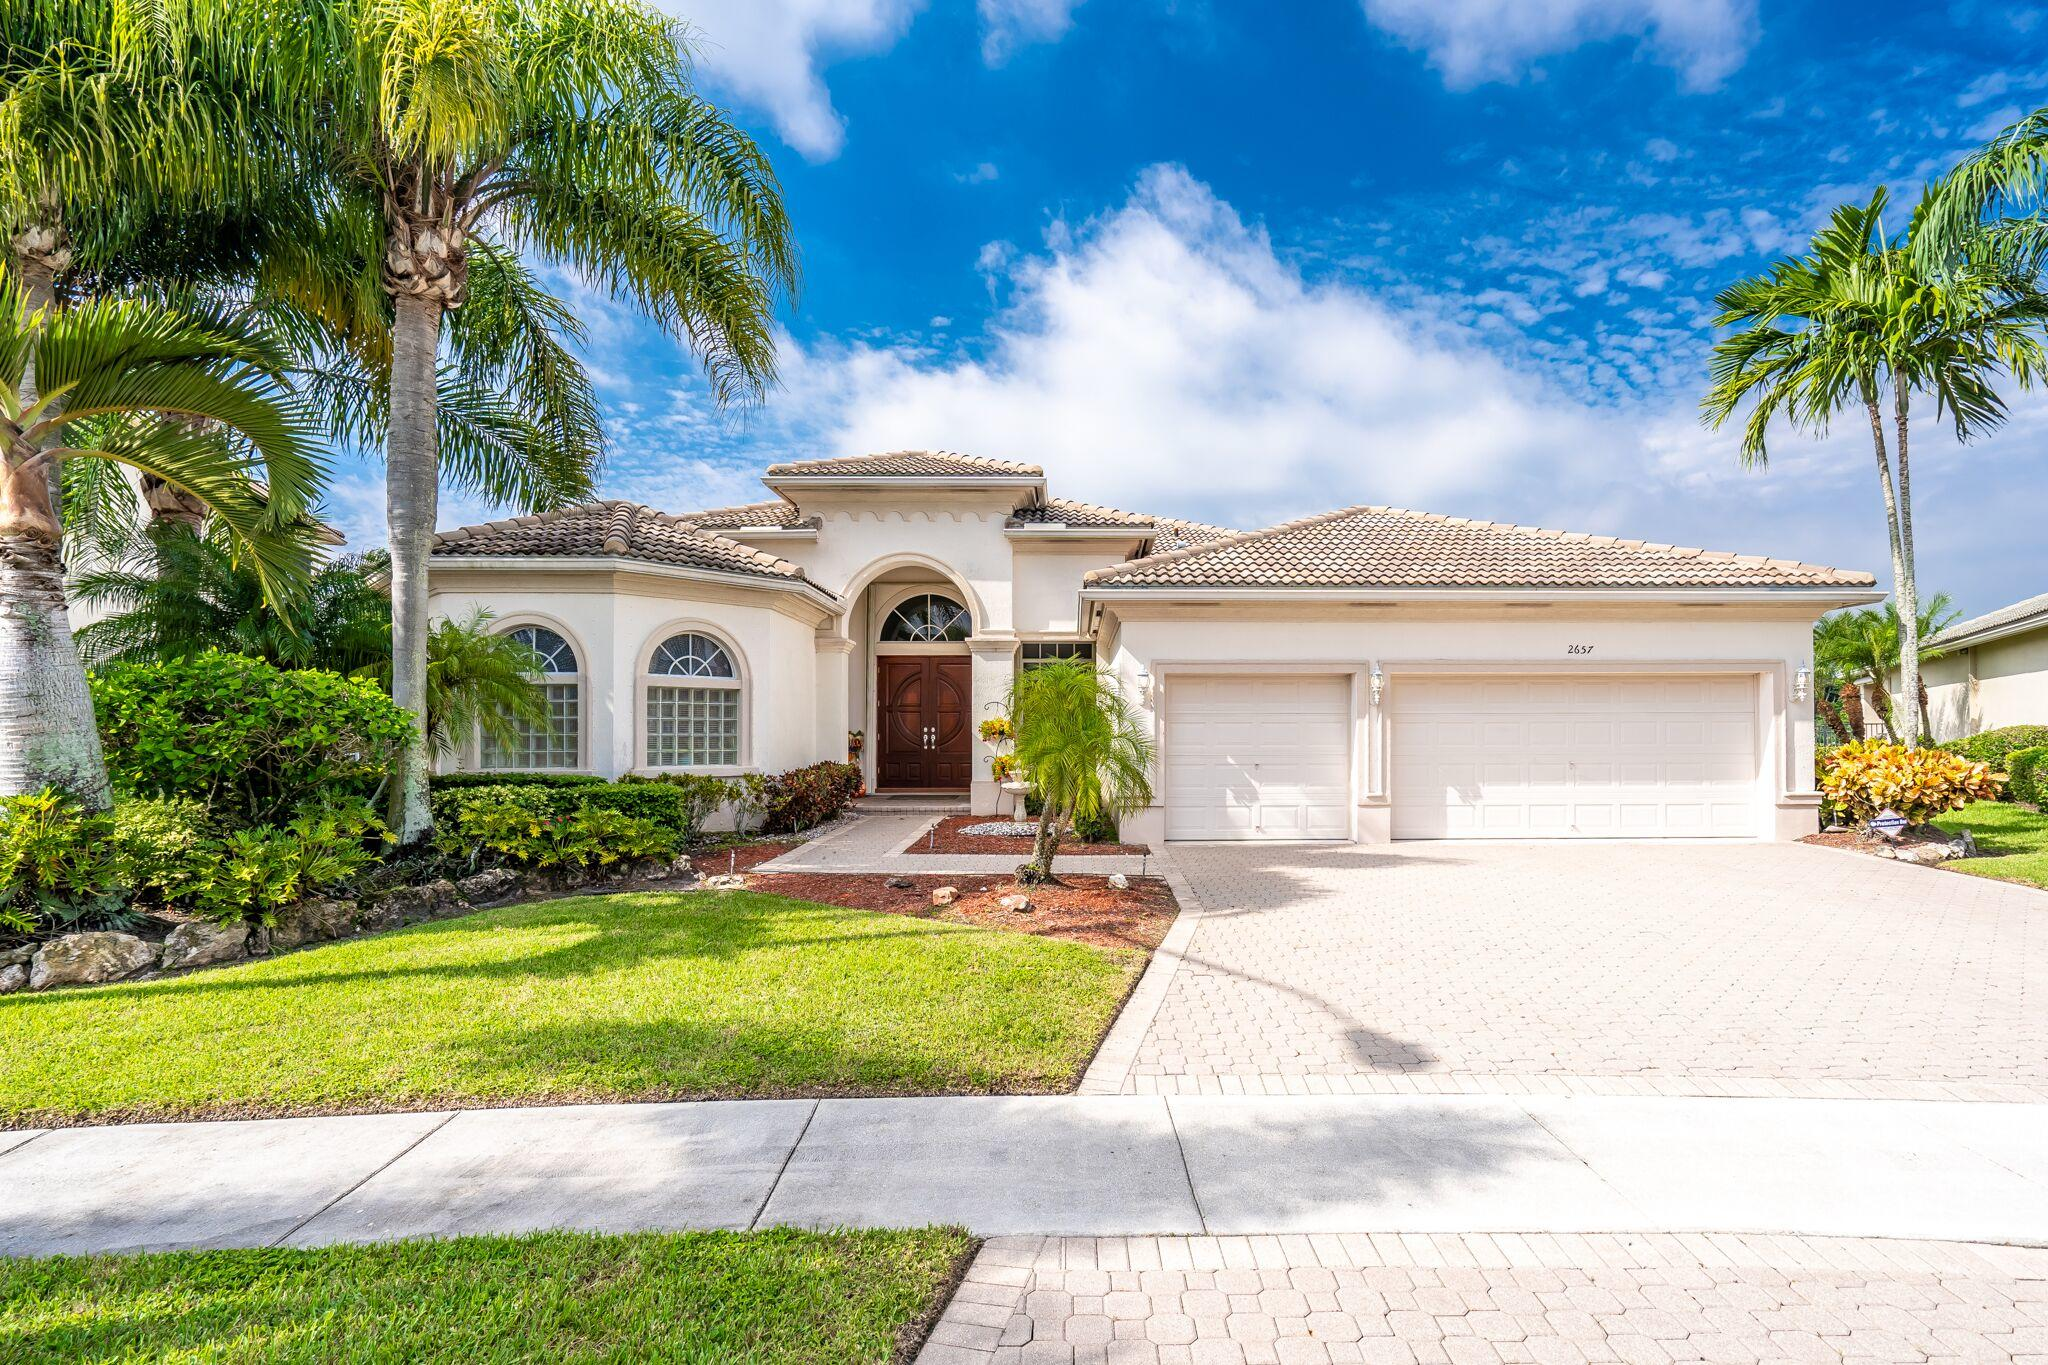 Photo of 2657 Windwood Way, Royal Palm Beach, FL 33411